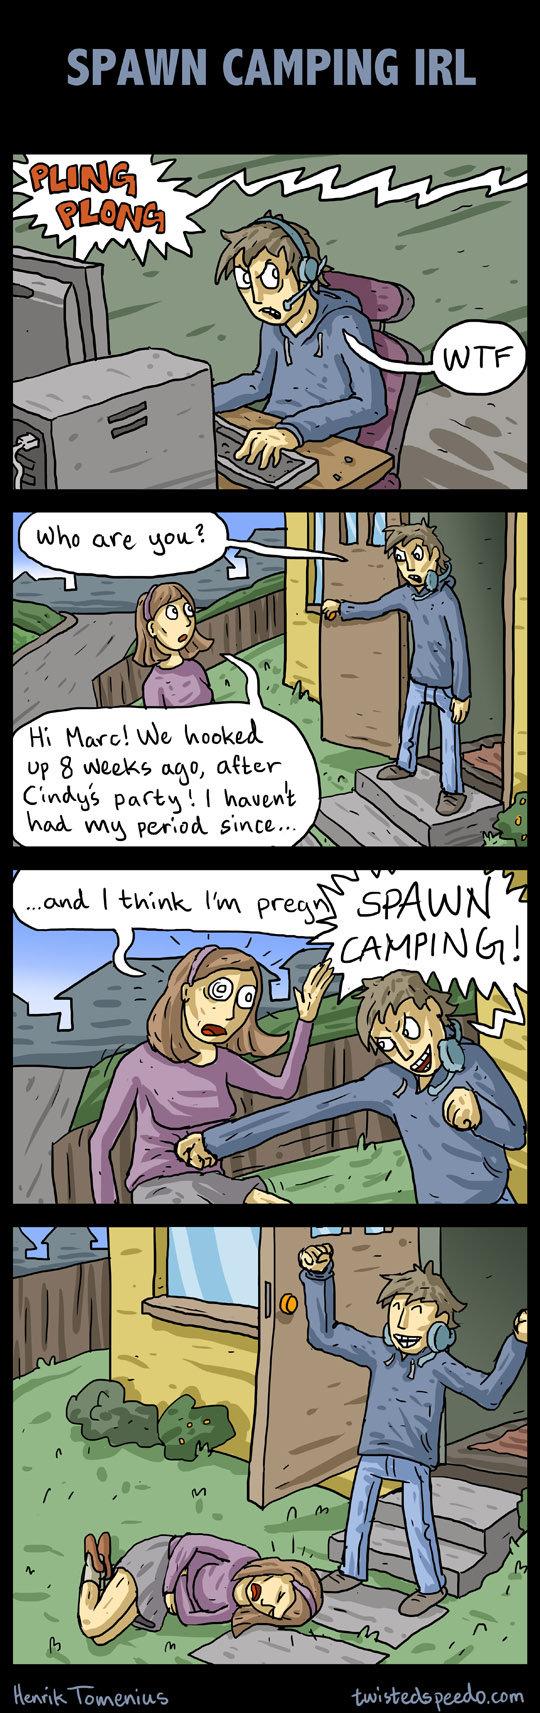 Spawn Camping IRL. whgdkng.jdznh.ldnh.lfgzh. lol